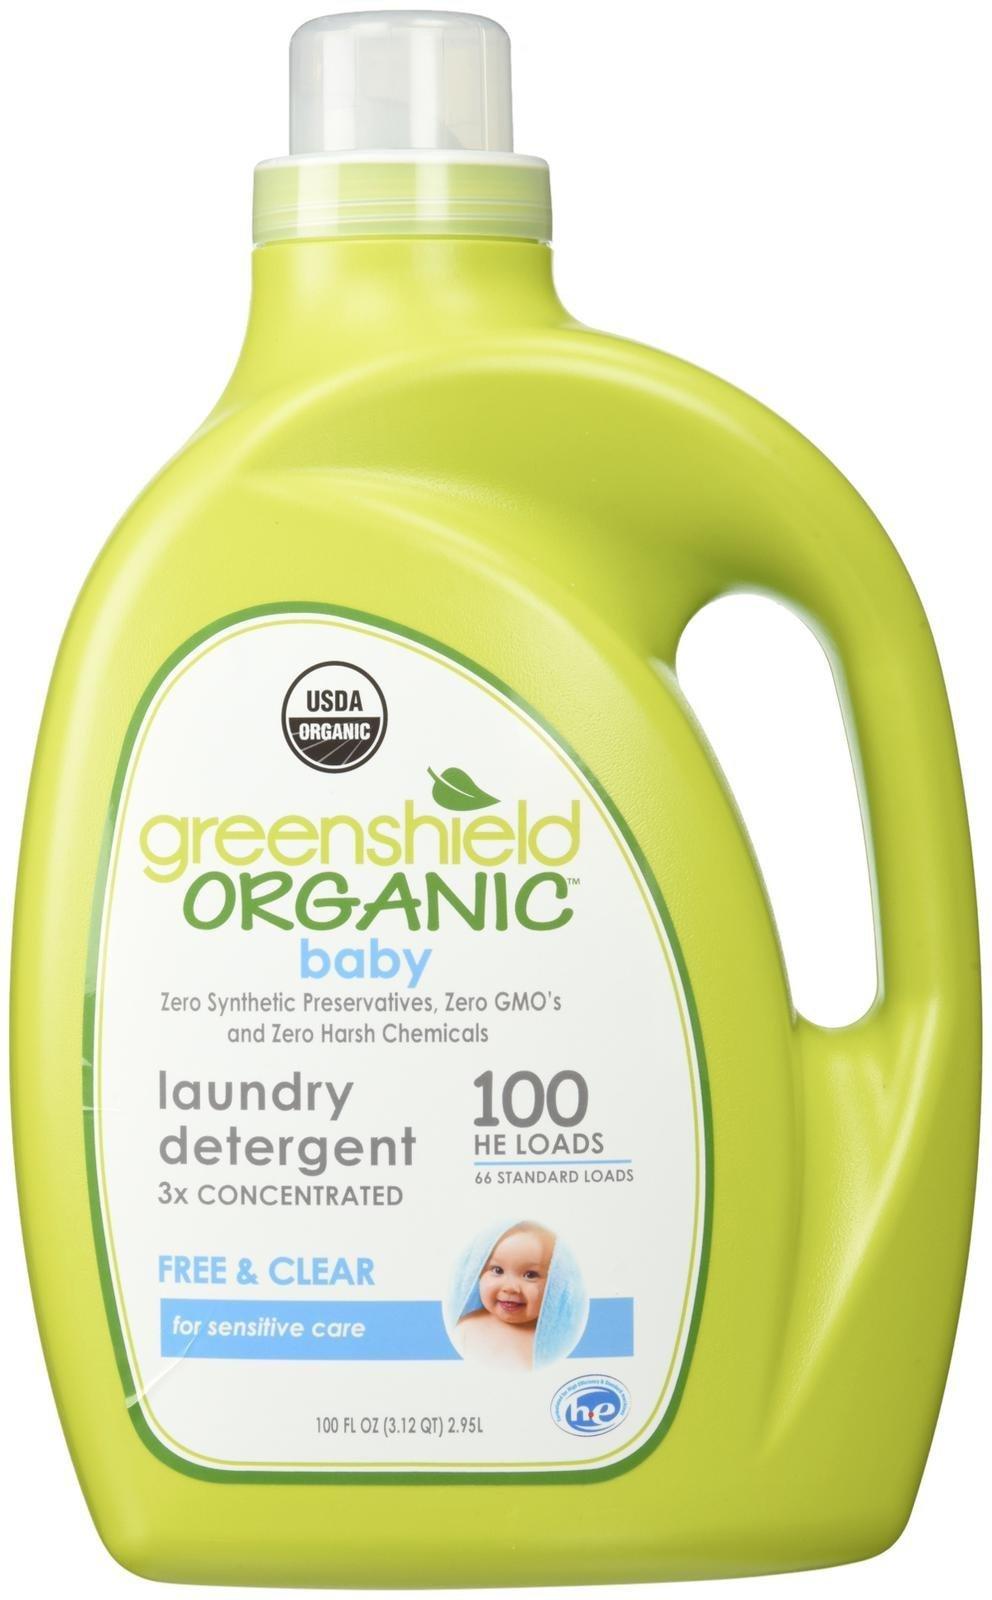 he detergent brands greenshield organic usda certified baby laundry detergent 100 ounce cheap detergent brands find